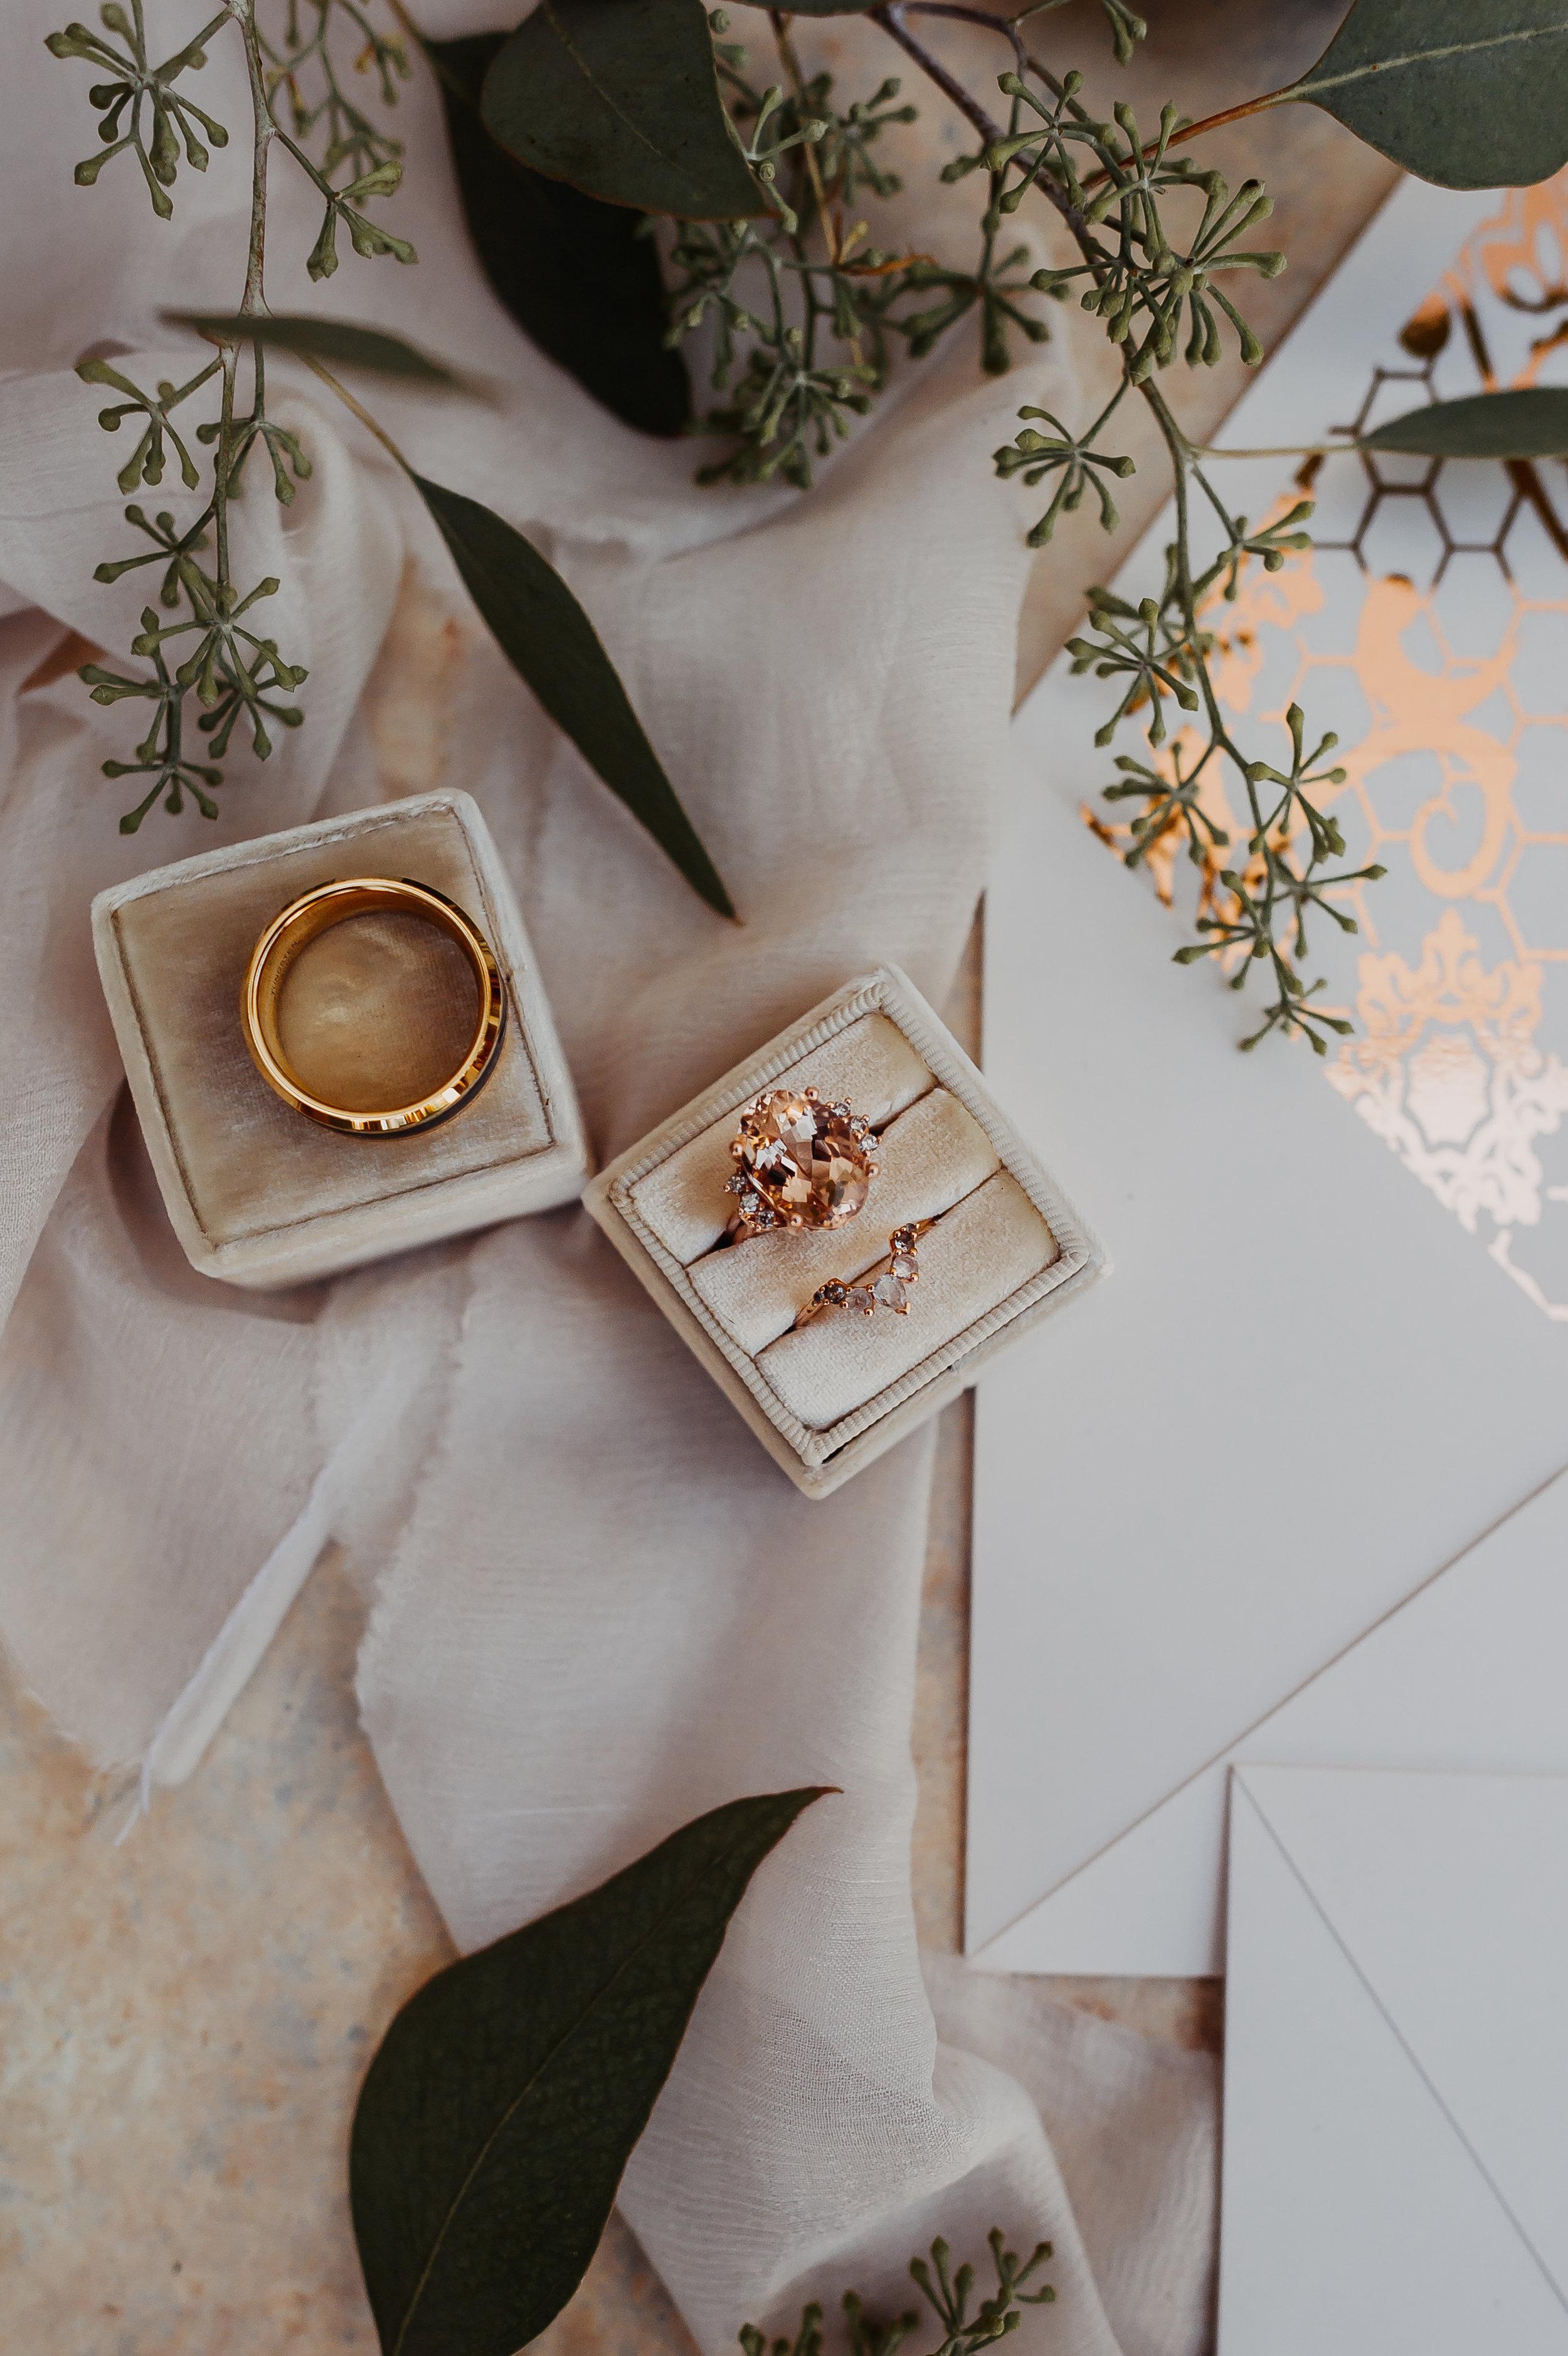 www.santabarbarawedding.com | Michelle Ramirez Photography | Olivas Adobe | Karen Marie Events | Tangled Lotus | The Mrs. Box | Gems by Joseph | Wedding Rings